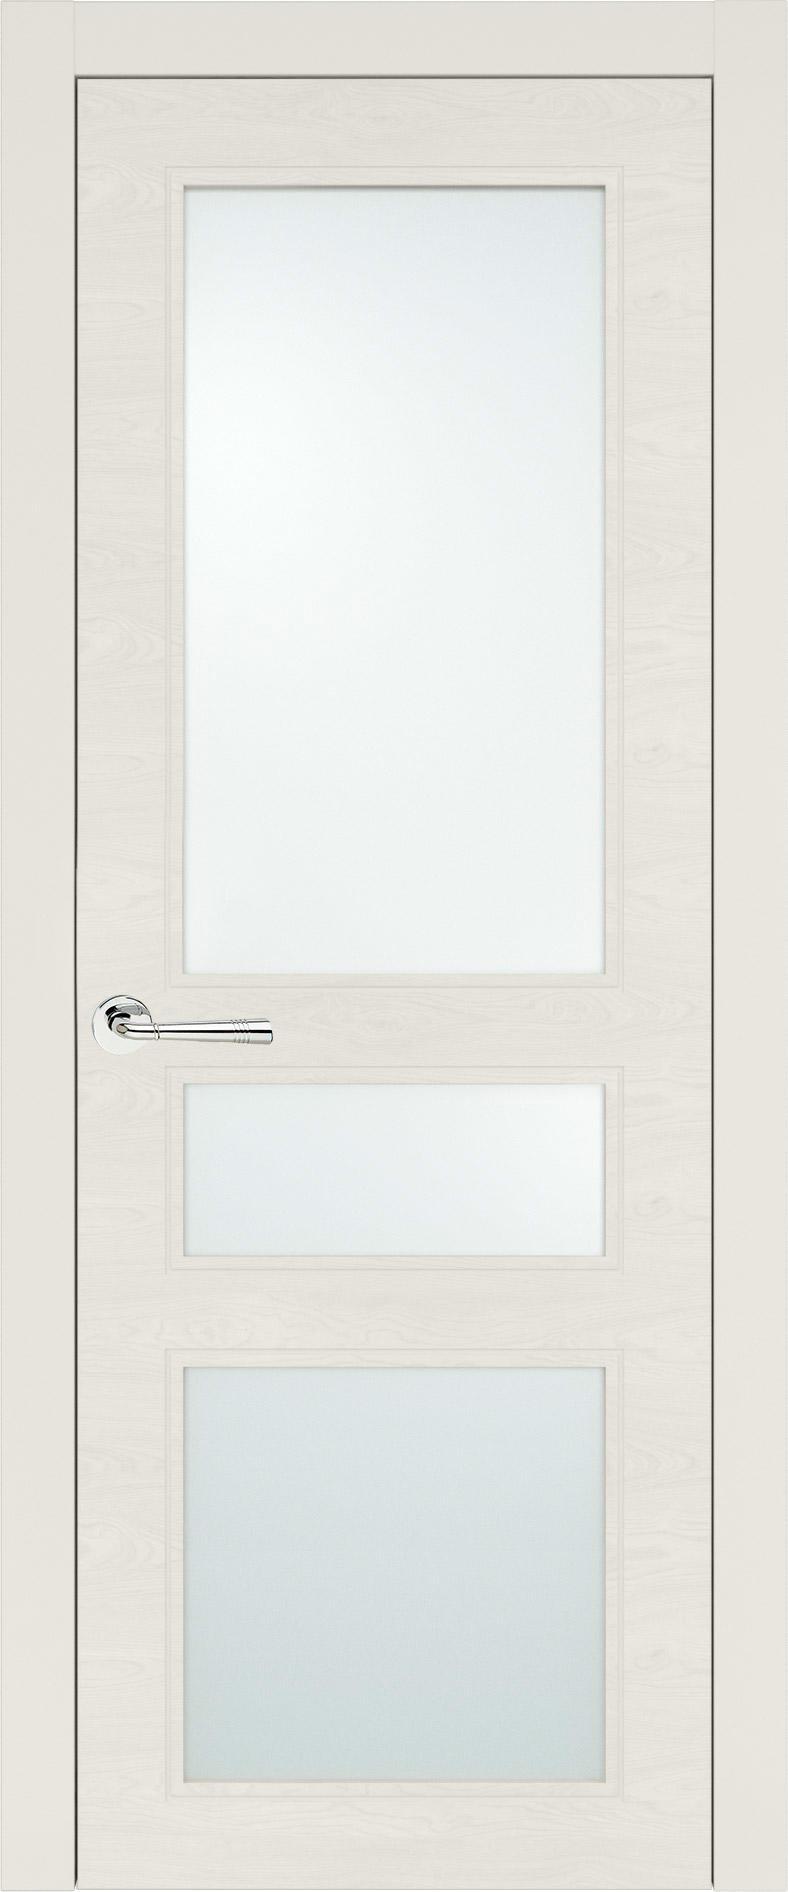 Imperia-R Neo Classic цвет - Бежевая эмаль по шпону (RAL 9010) Со стеклом (ДО)